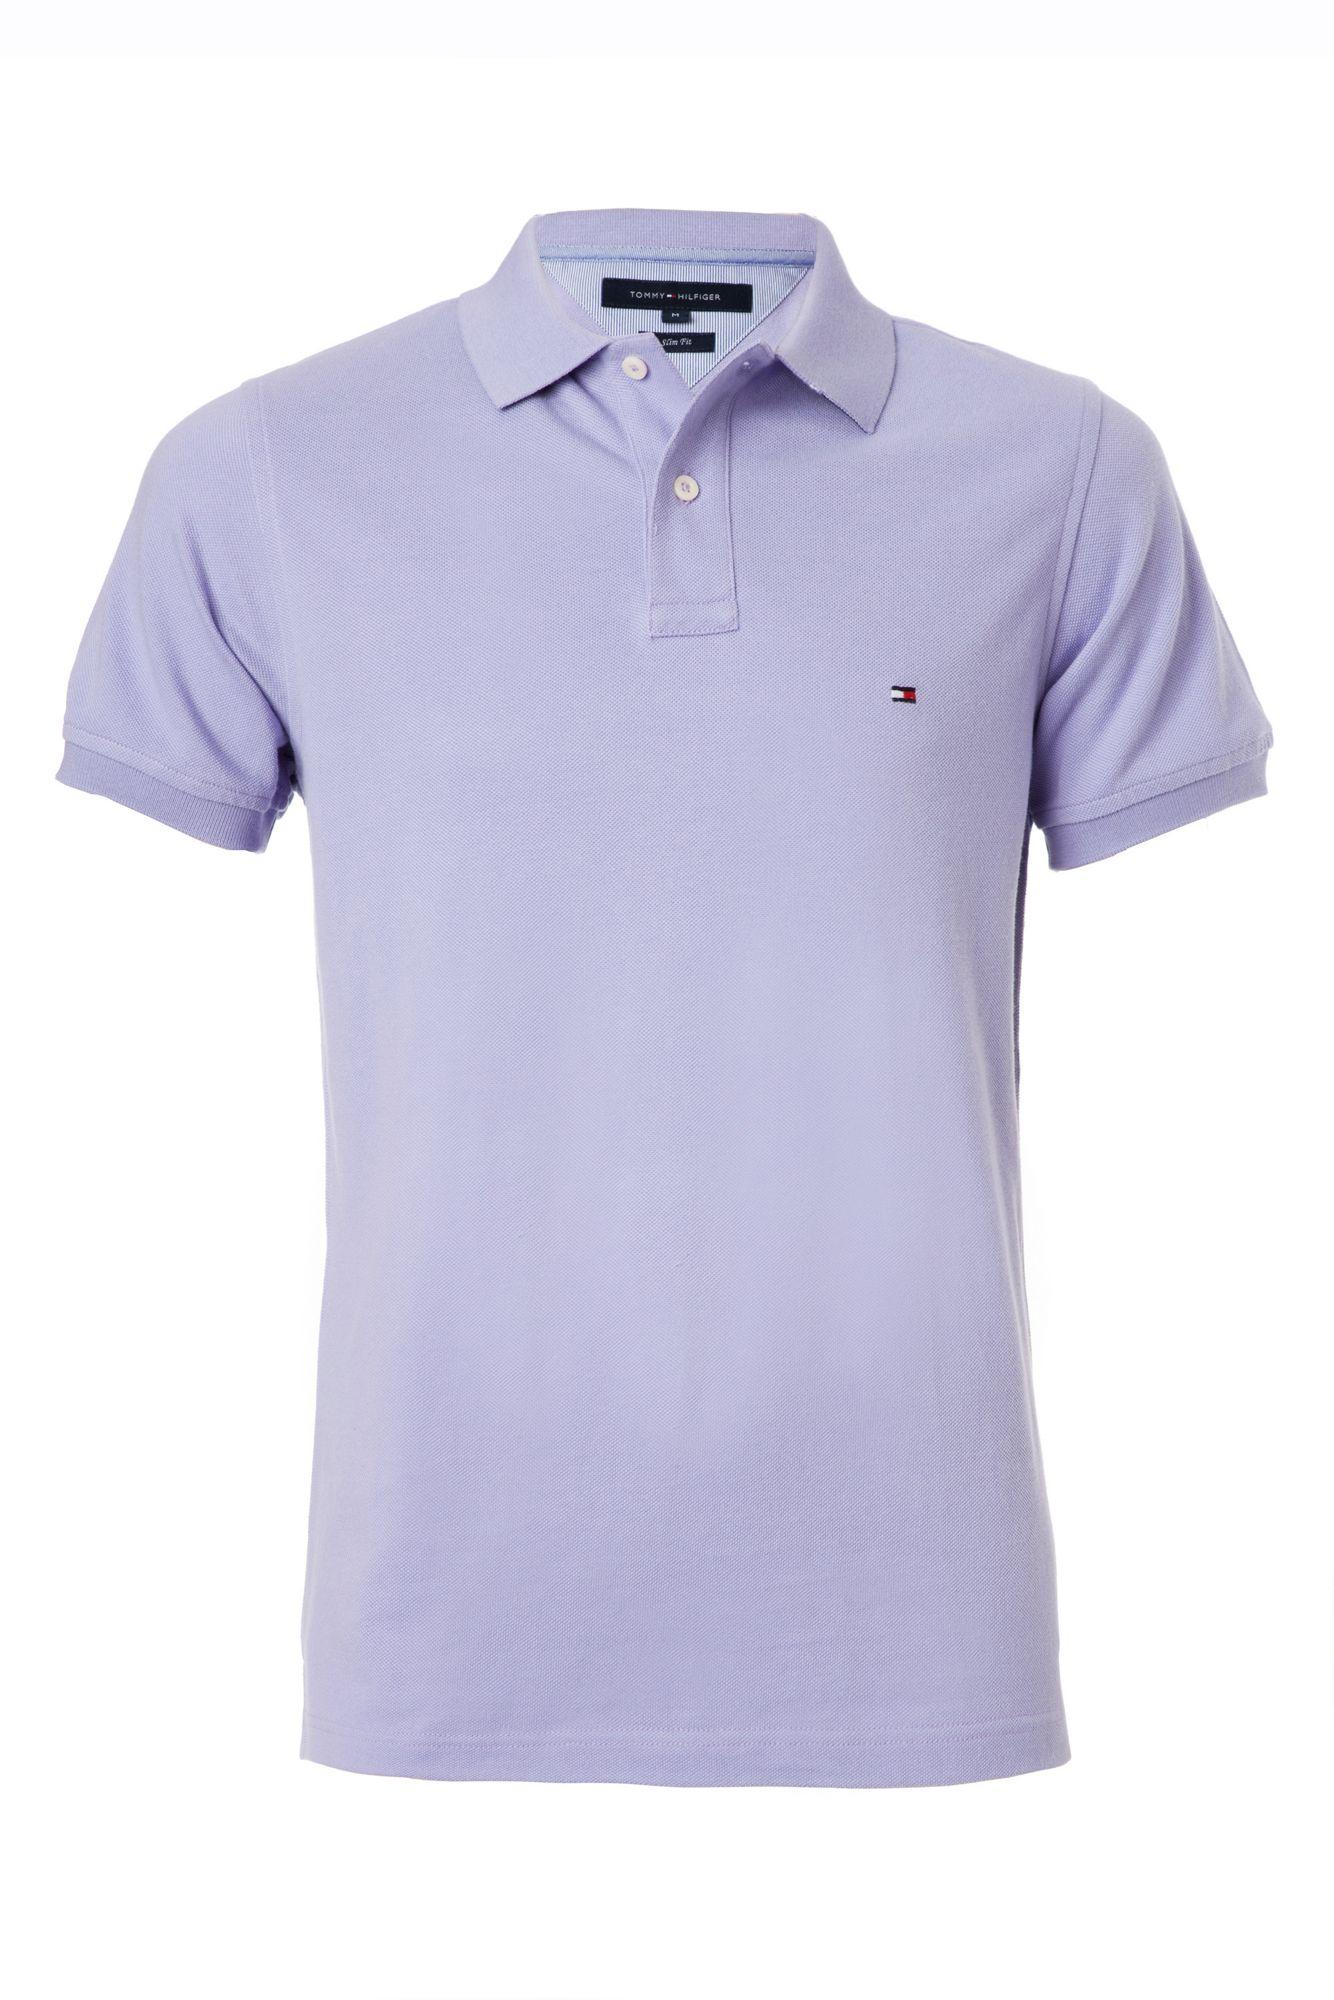 tommy hilfiger slim fit washed polo in purple for men lyst. Black Bedroom Furniture Sets. Home Design Ideas